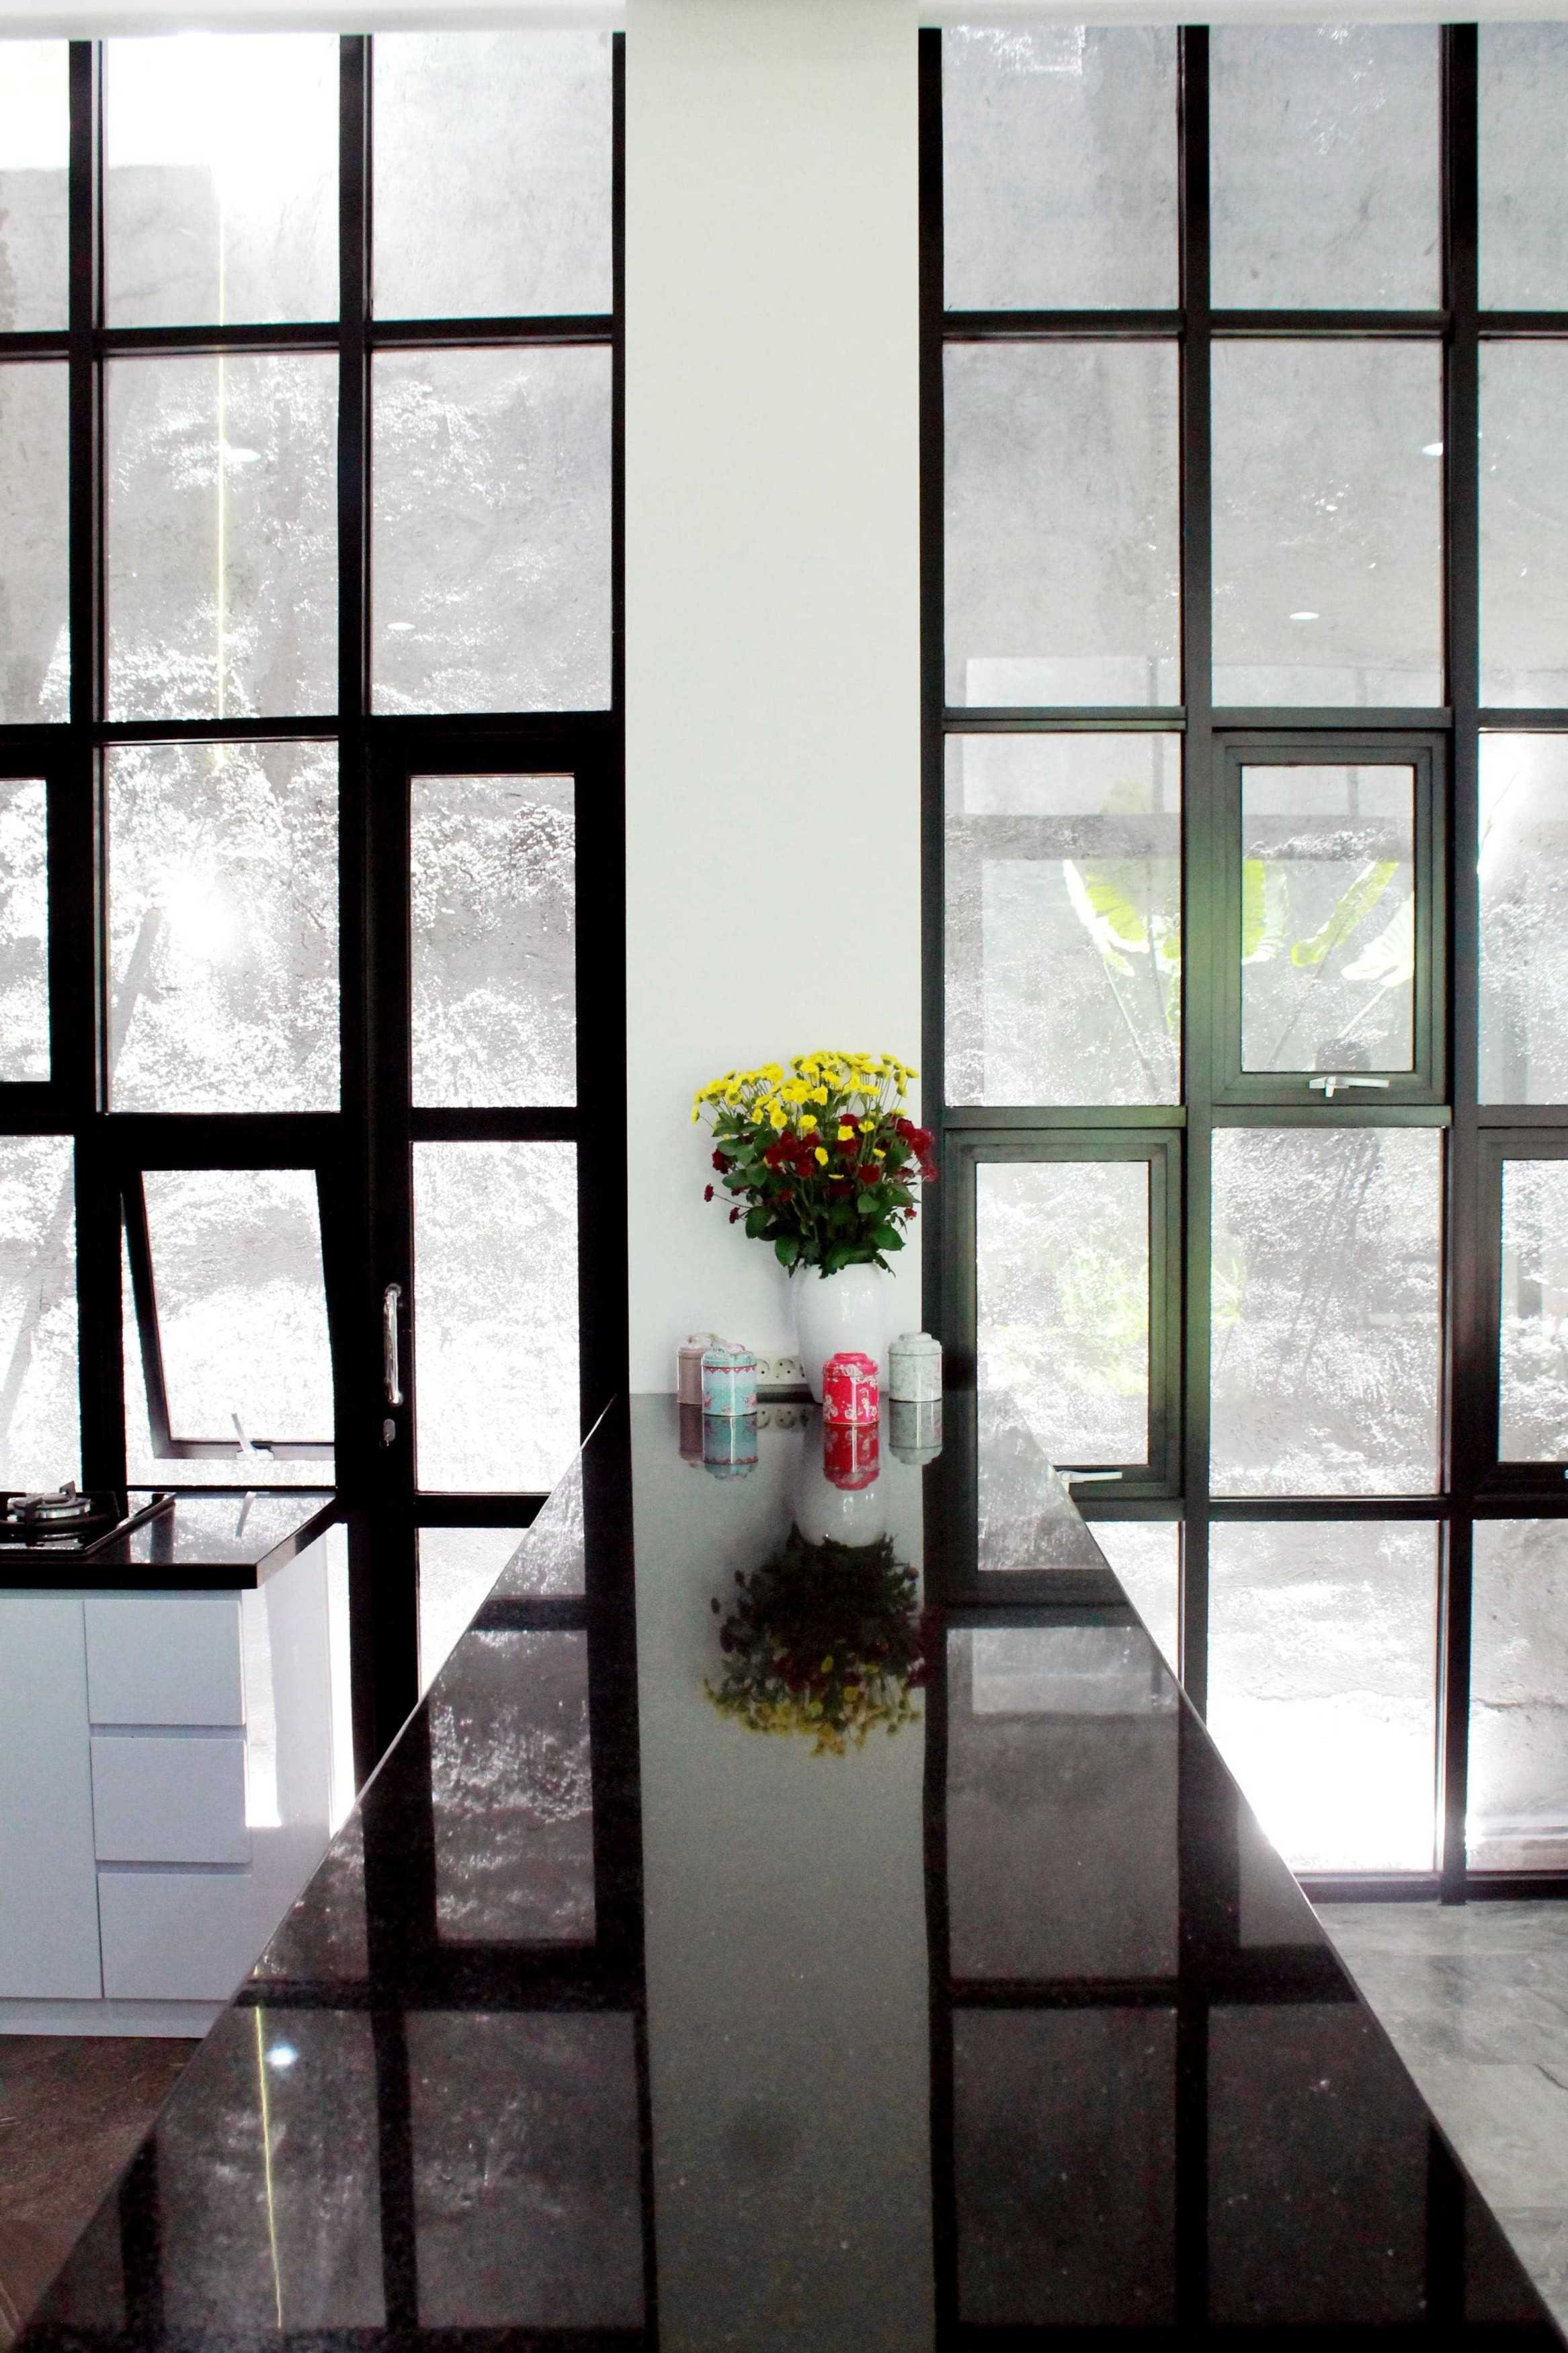 Ruang Desain White And Wood Surabaya, Kota Sby, Jawa Timur, Indonesia Surabaya, Kota Sby, Jawa Timur, Indonesia Ruang-Desain-White-And-Wood   92001